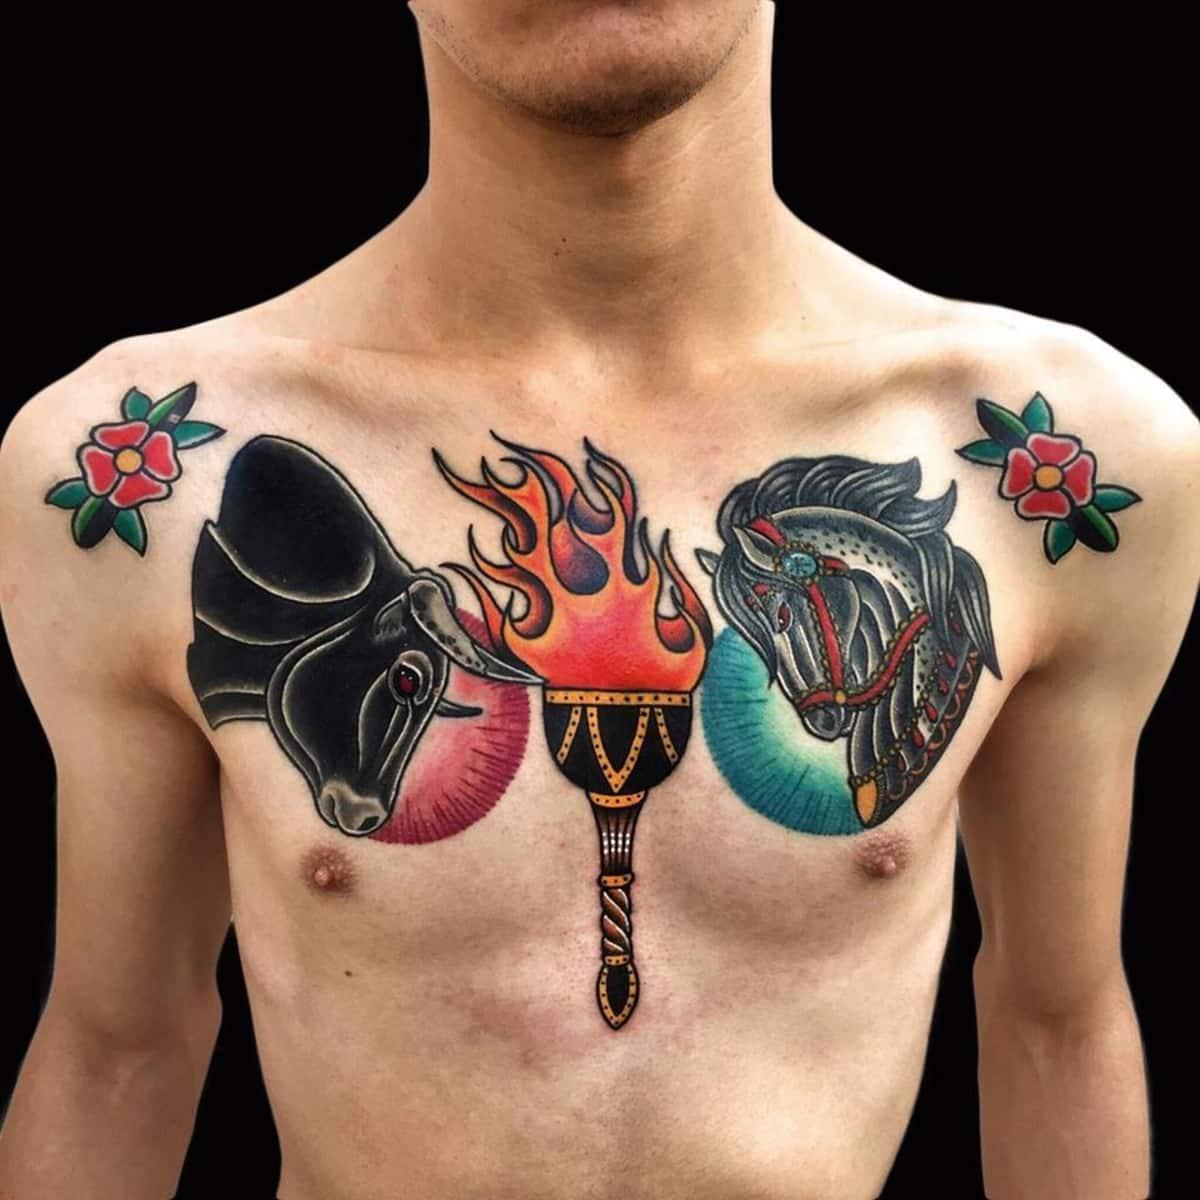 Tatuajes Piercing Bogotá arkham tattoo bogotá | tatuajes / piercings | chapinero central